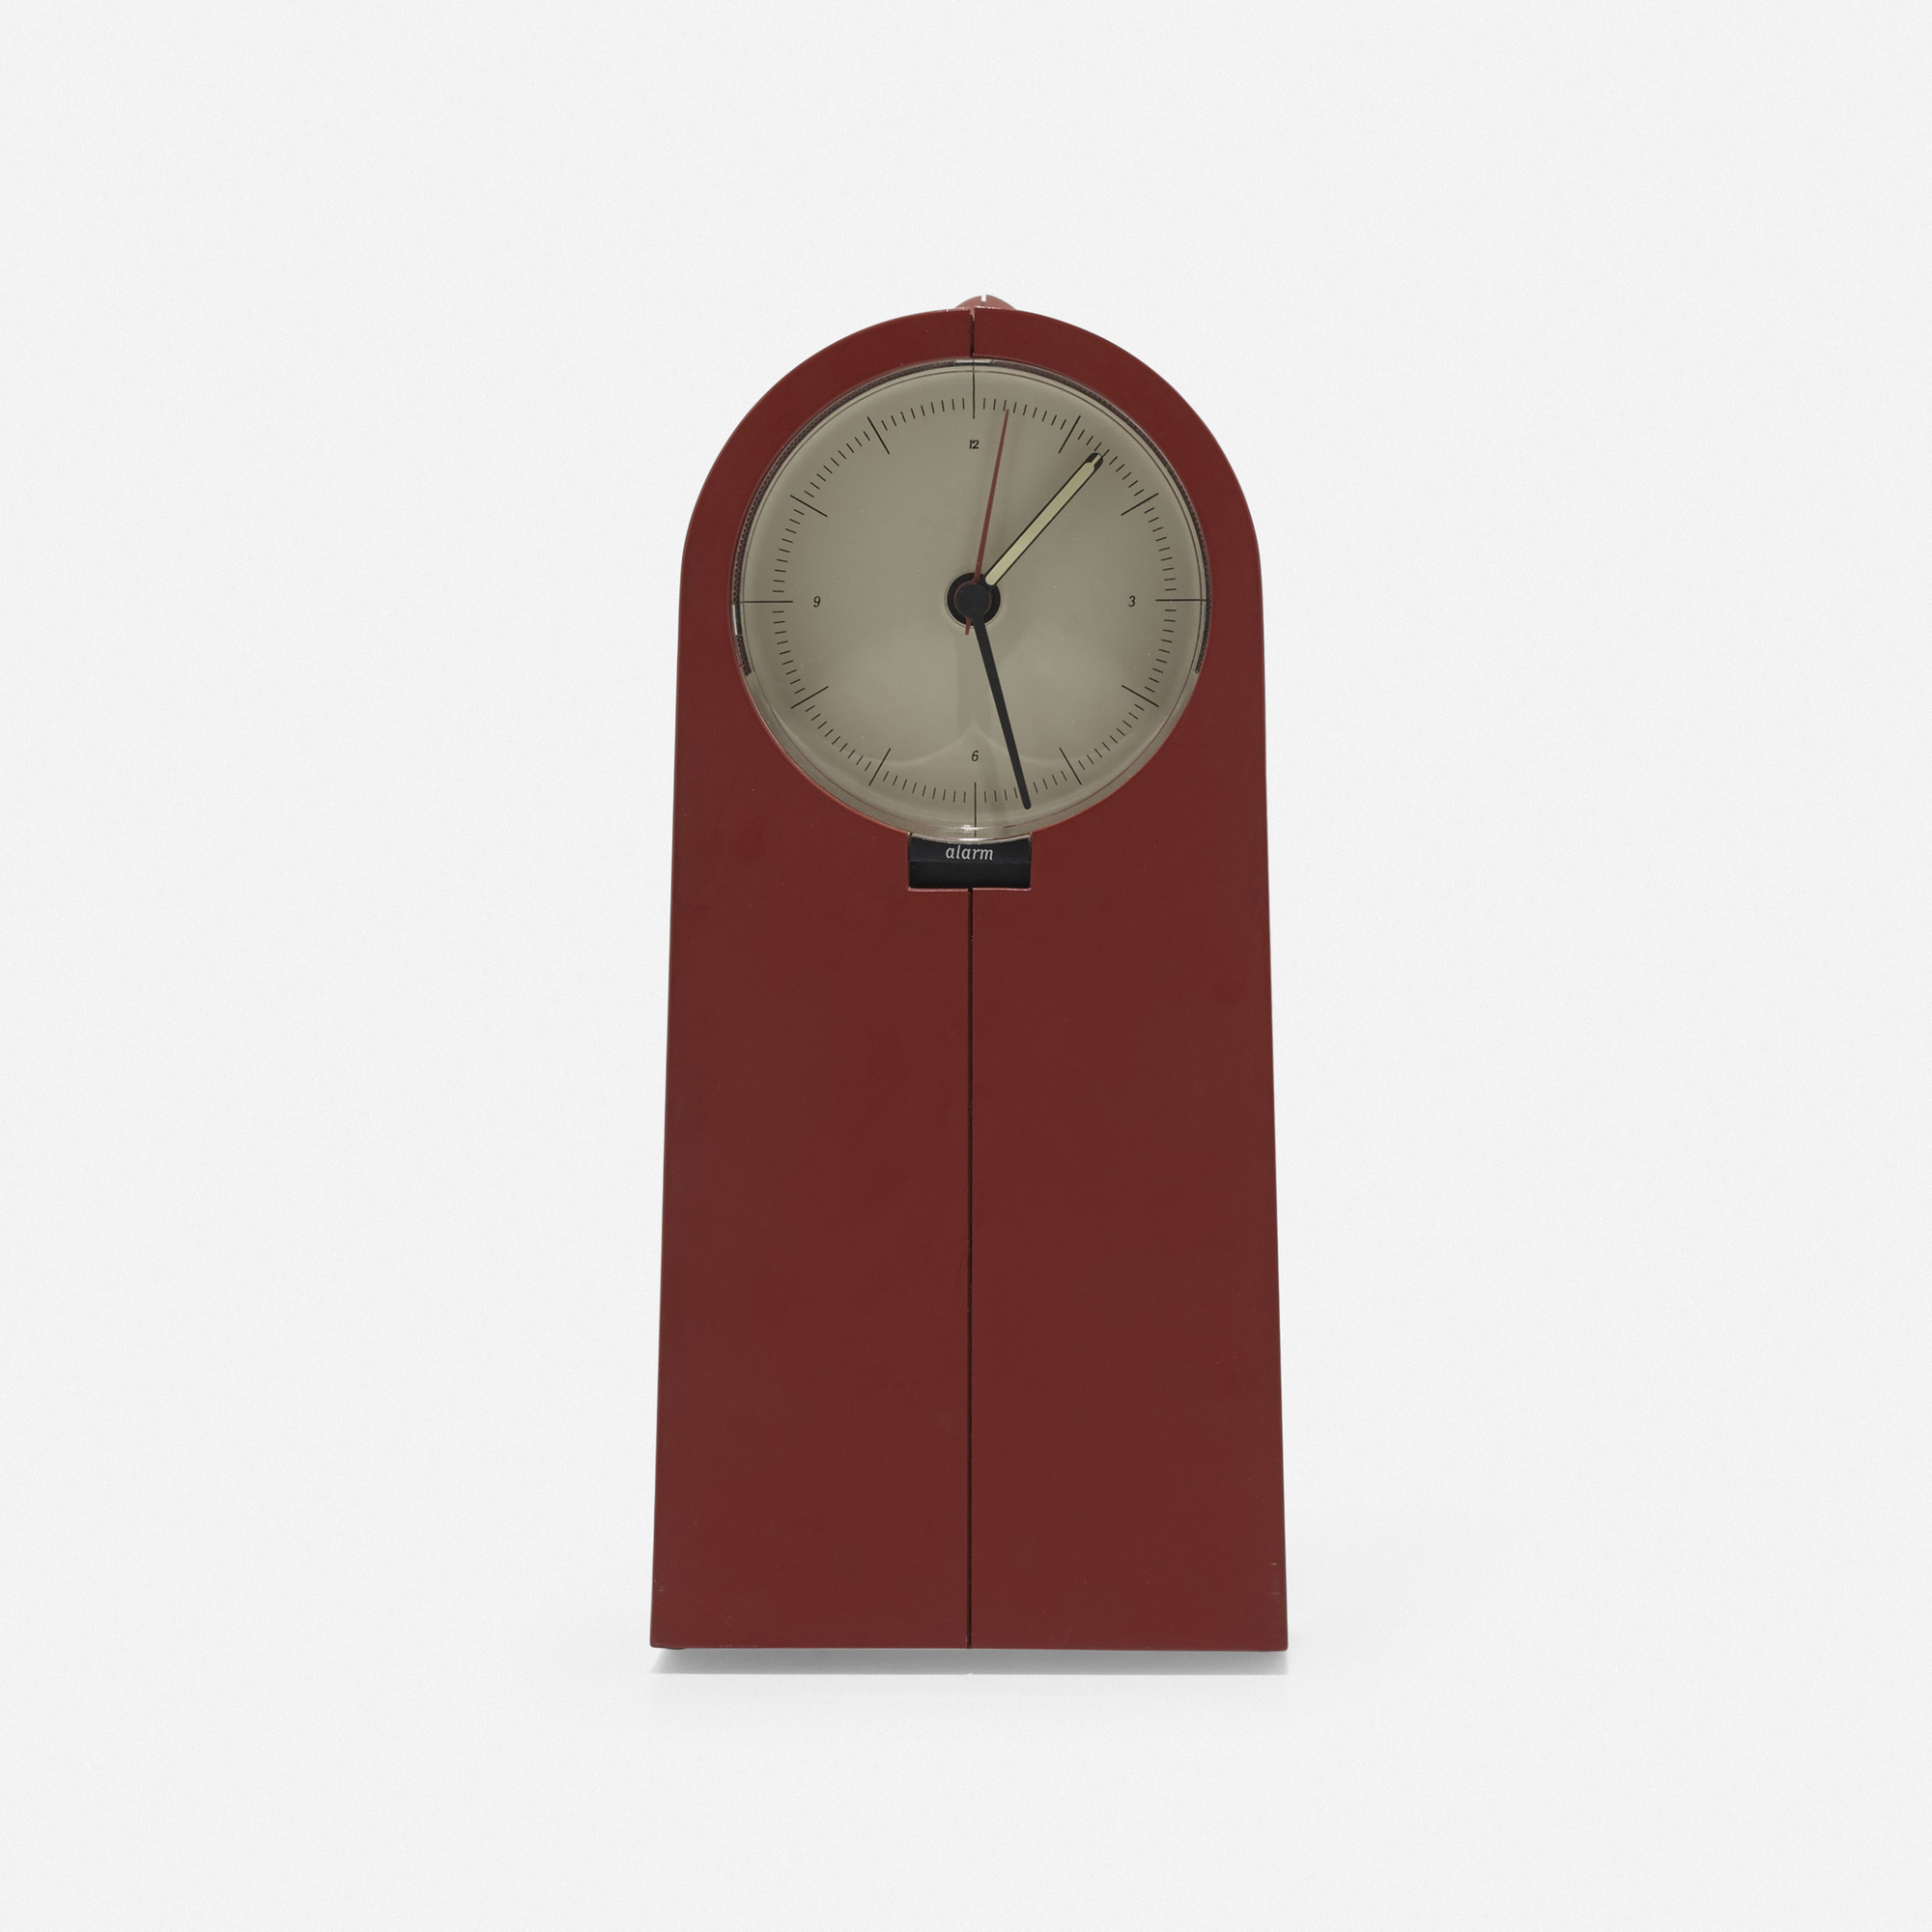 272: Philippe Starck / Coo Coo radio alarm clock (2 of 3)